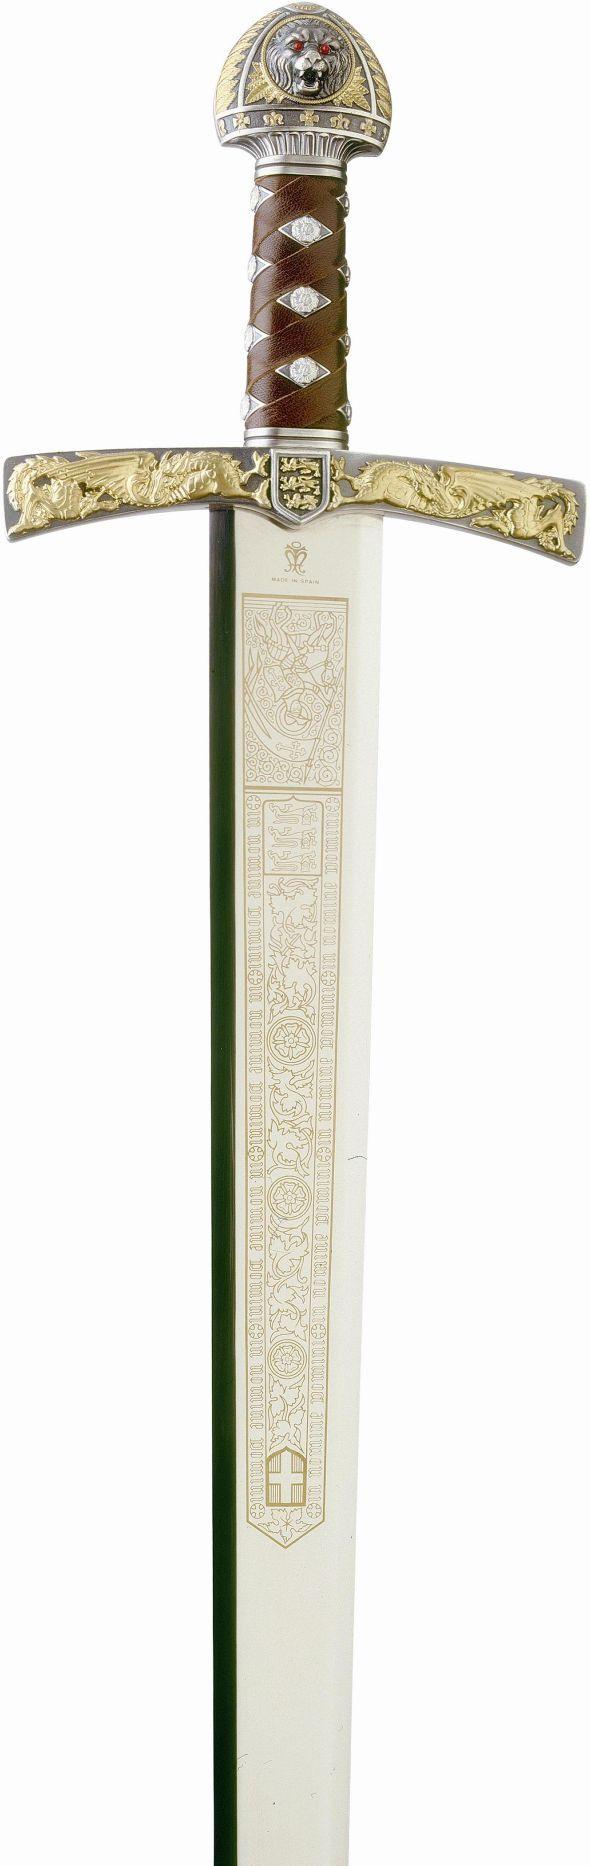 # 753 Richard the Lion Heart Sword by Marto of Toledo Spain